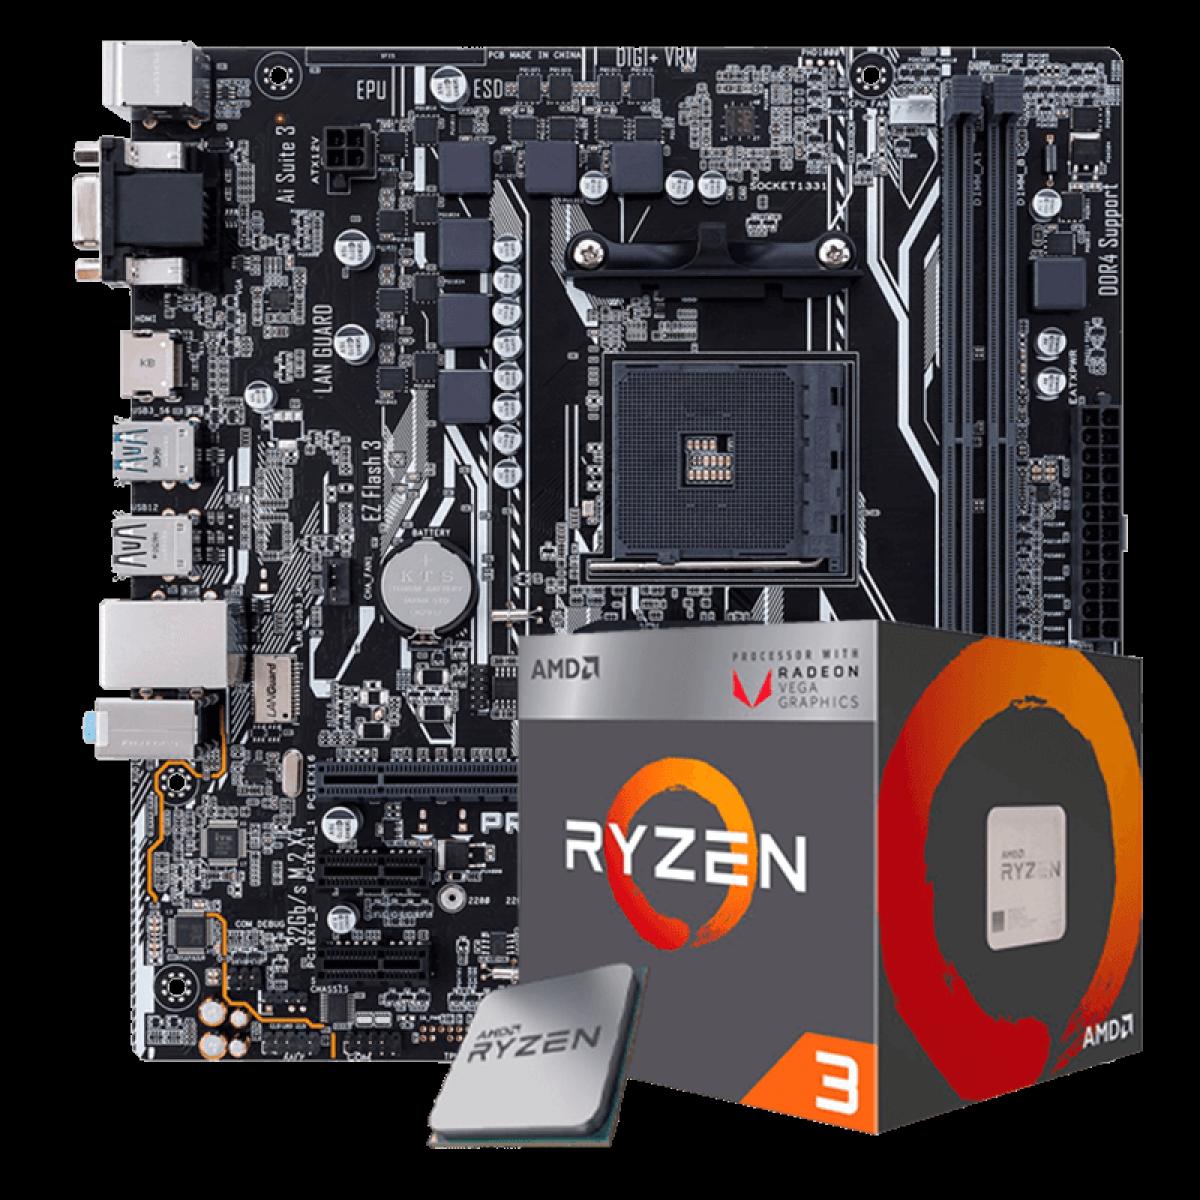 Kit Upgrade Placa Mãe Asus Prime A320M-K, AMD AM4 + Processador AMD Ryzen 3 2200G 3.5GHz